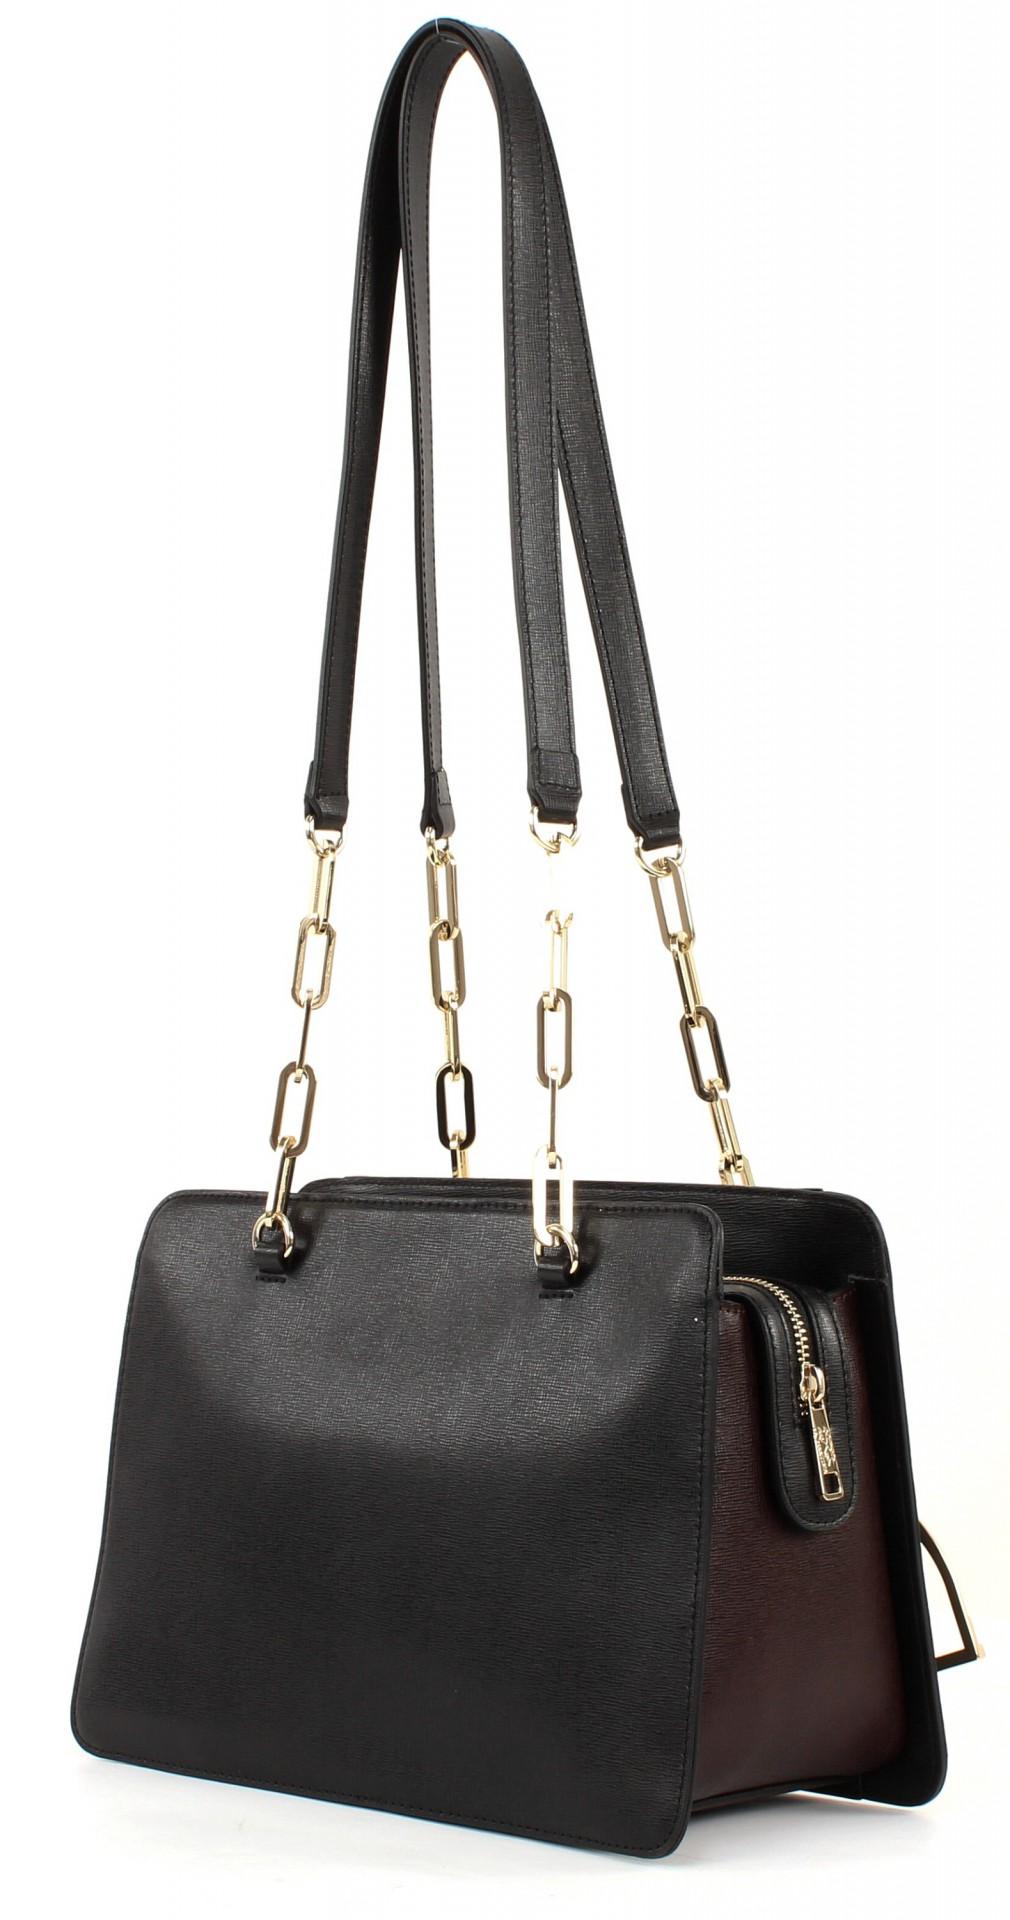 la martina new rodriquez shoulder bag tasche. Black Bedroom Furniture Sets. Home Design Ideas